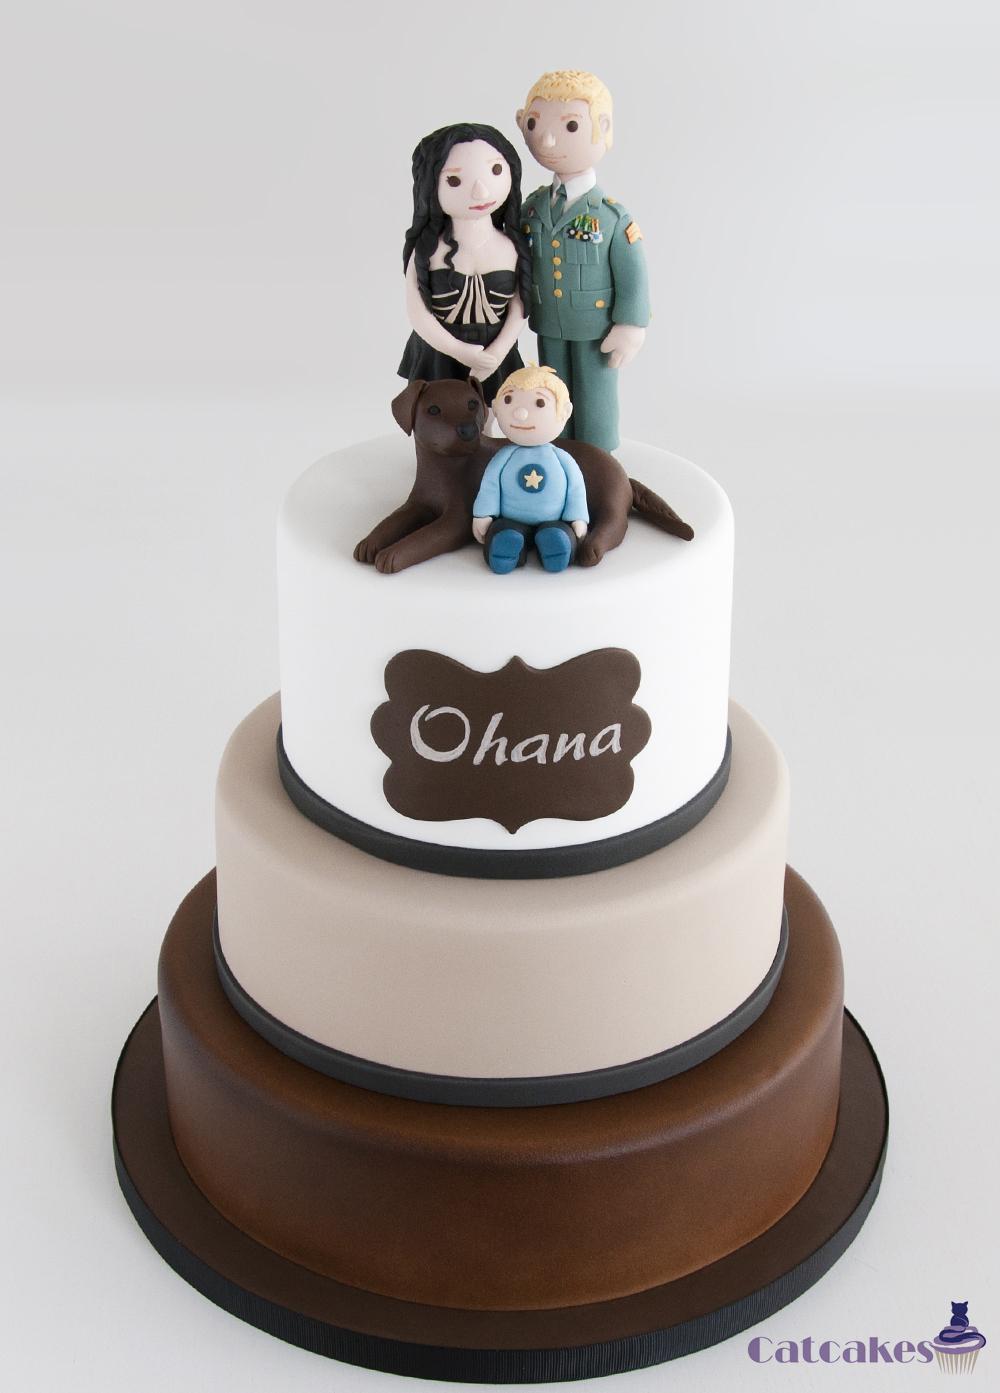 Tarta de boda con figuras personalizadas